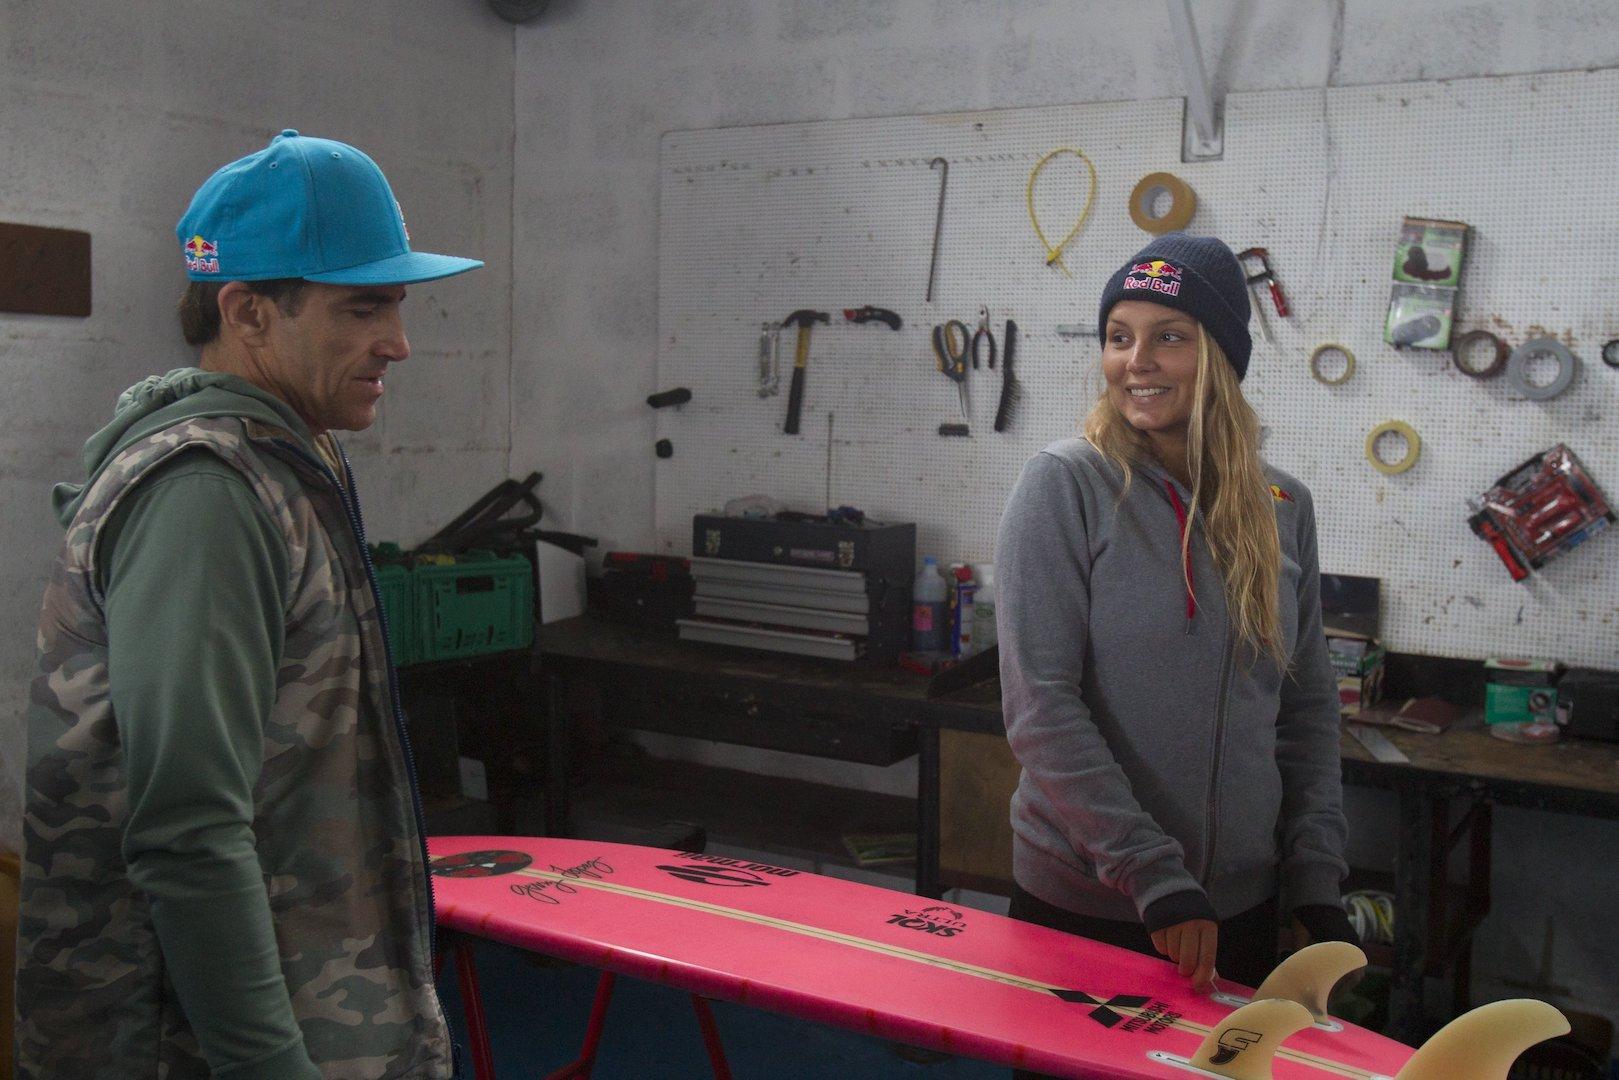 Carlos Burle and Maya Gabeira prepare their surfboards at Porto de Abrigo in Nazare, Portugal on October 11, 2015 // Hugo Silva/Red Bull Content Pool.